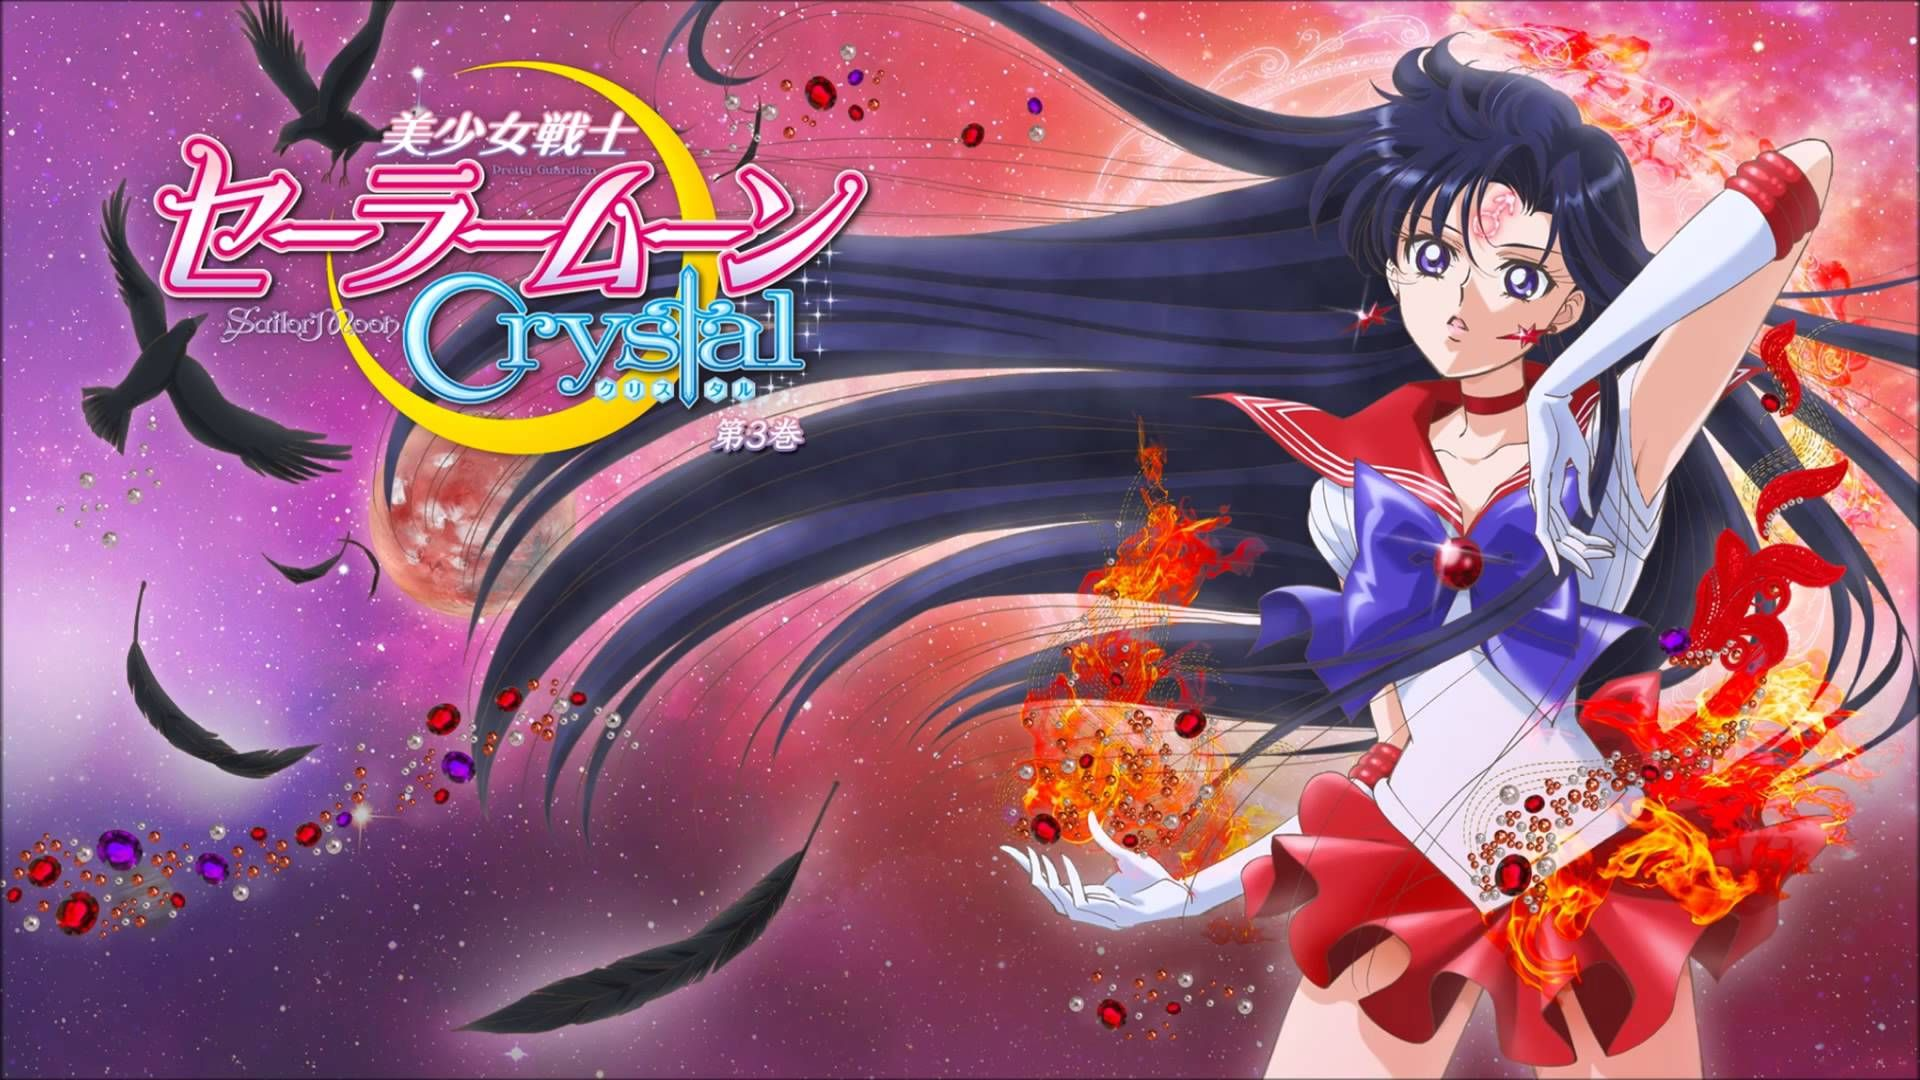 Rei Hino Sailor Mars Sailor Moon Crystal Sailor Moon Sailor Mars